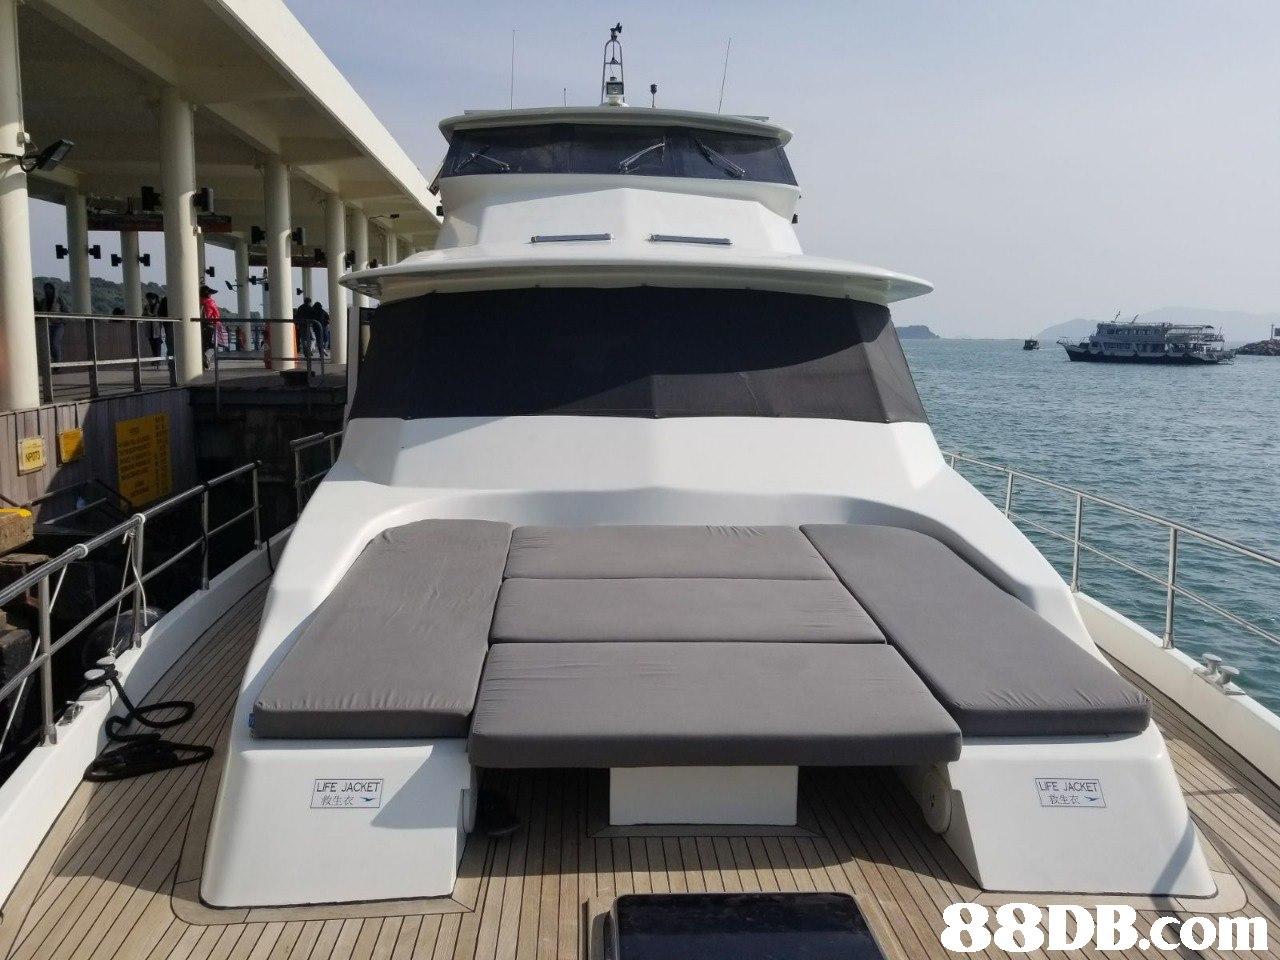 LIFE JACKET 救生衣 LFE JACKET 孜生衣   Vehicle,Yacht,Water transportation,Boat,Luxury yacht